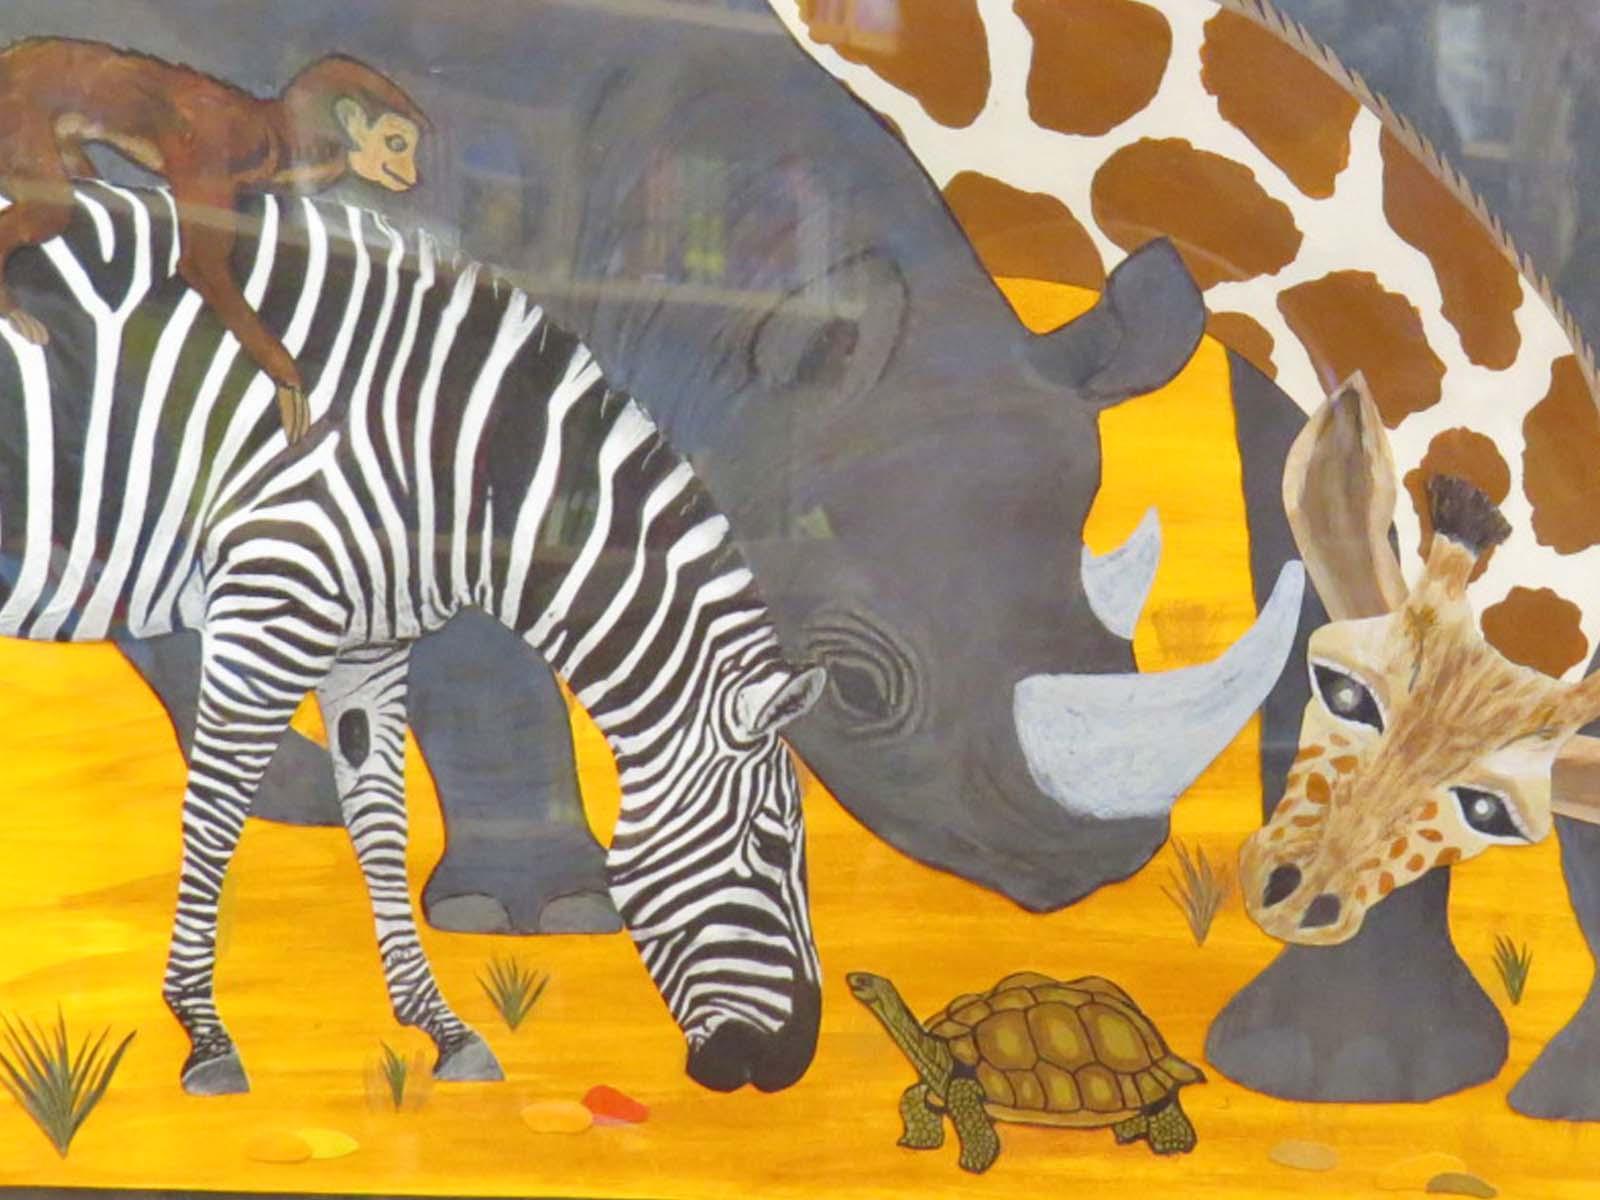 INMED OC - Nelda's Illustration2 - Animal Village @ B&N